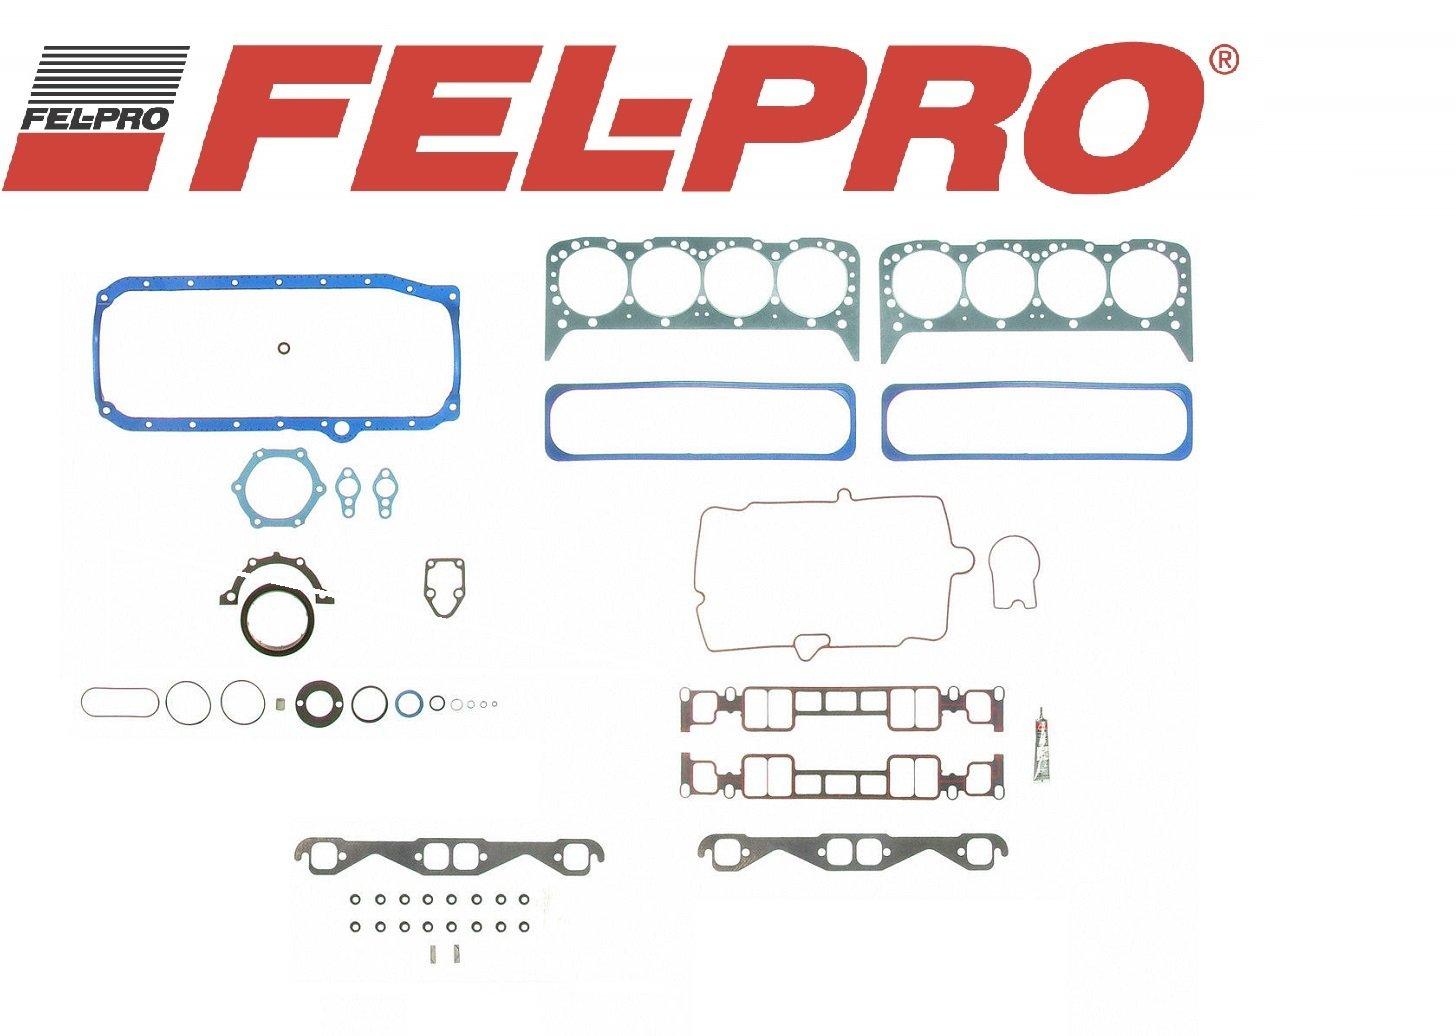 Chevy 350 5.7 VORTEC Fel Pro Full Gasket Set Head+Intake+Oil Pan+Exhaust 96-02 (Vortec VIN ''R'')